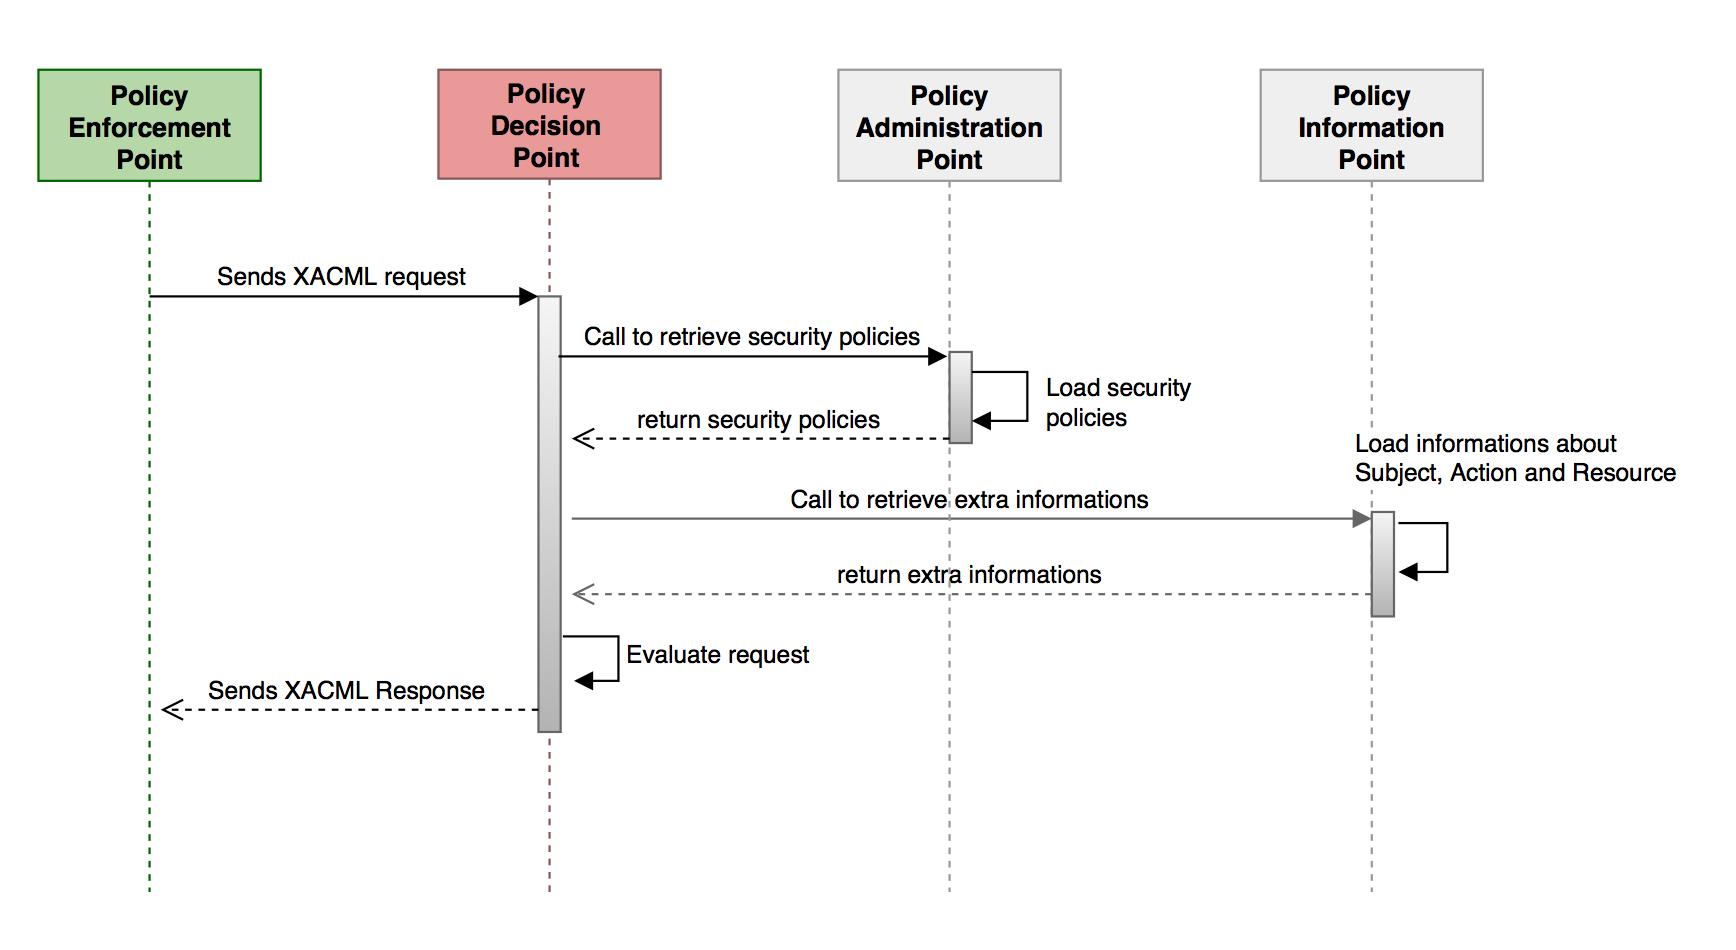 rbac-man sequence diagram